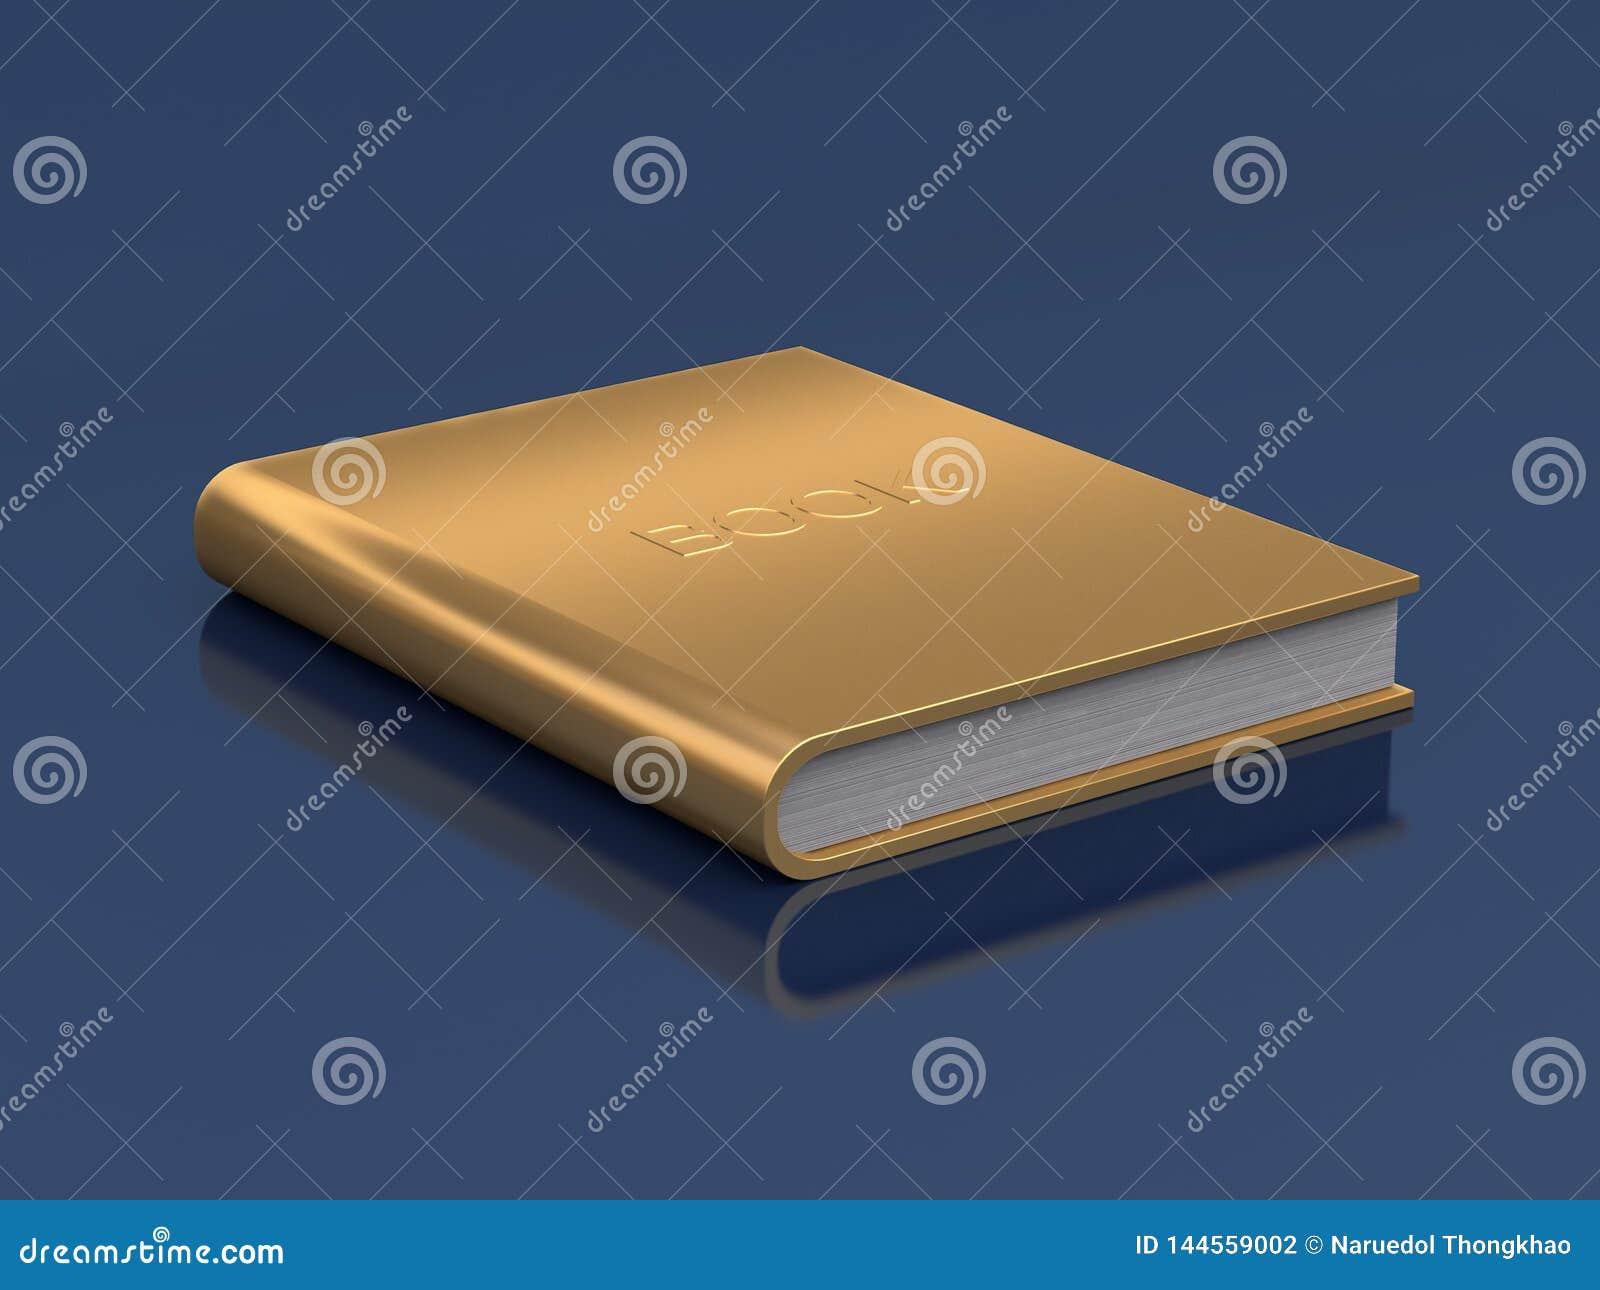 Gold book on floor reflection 3d render